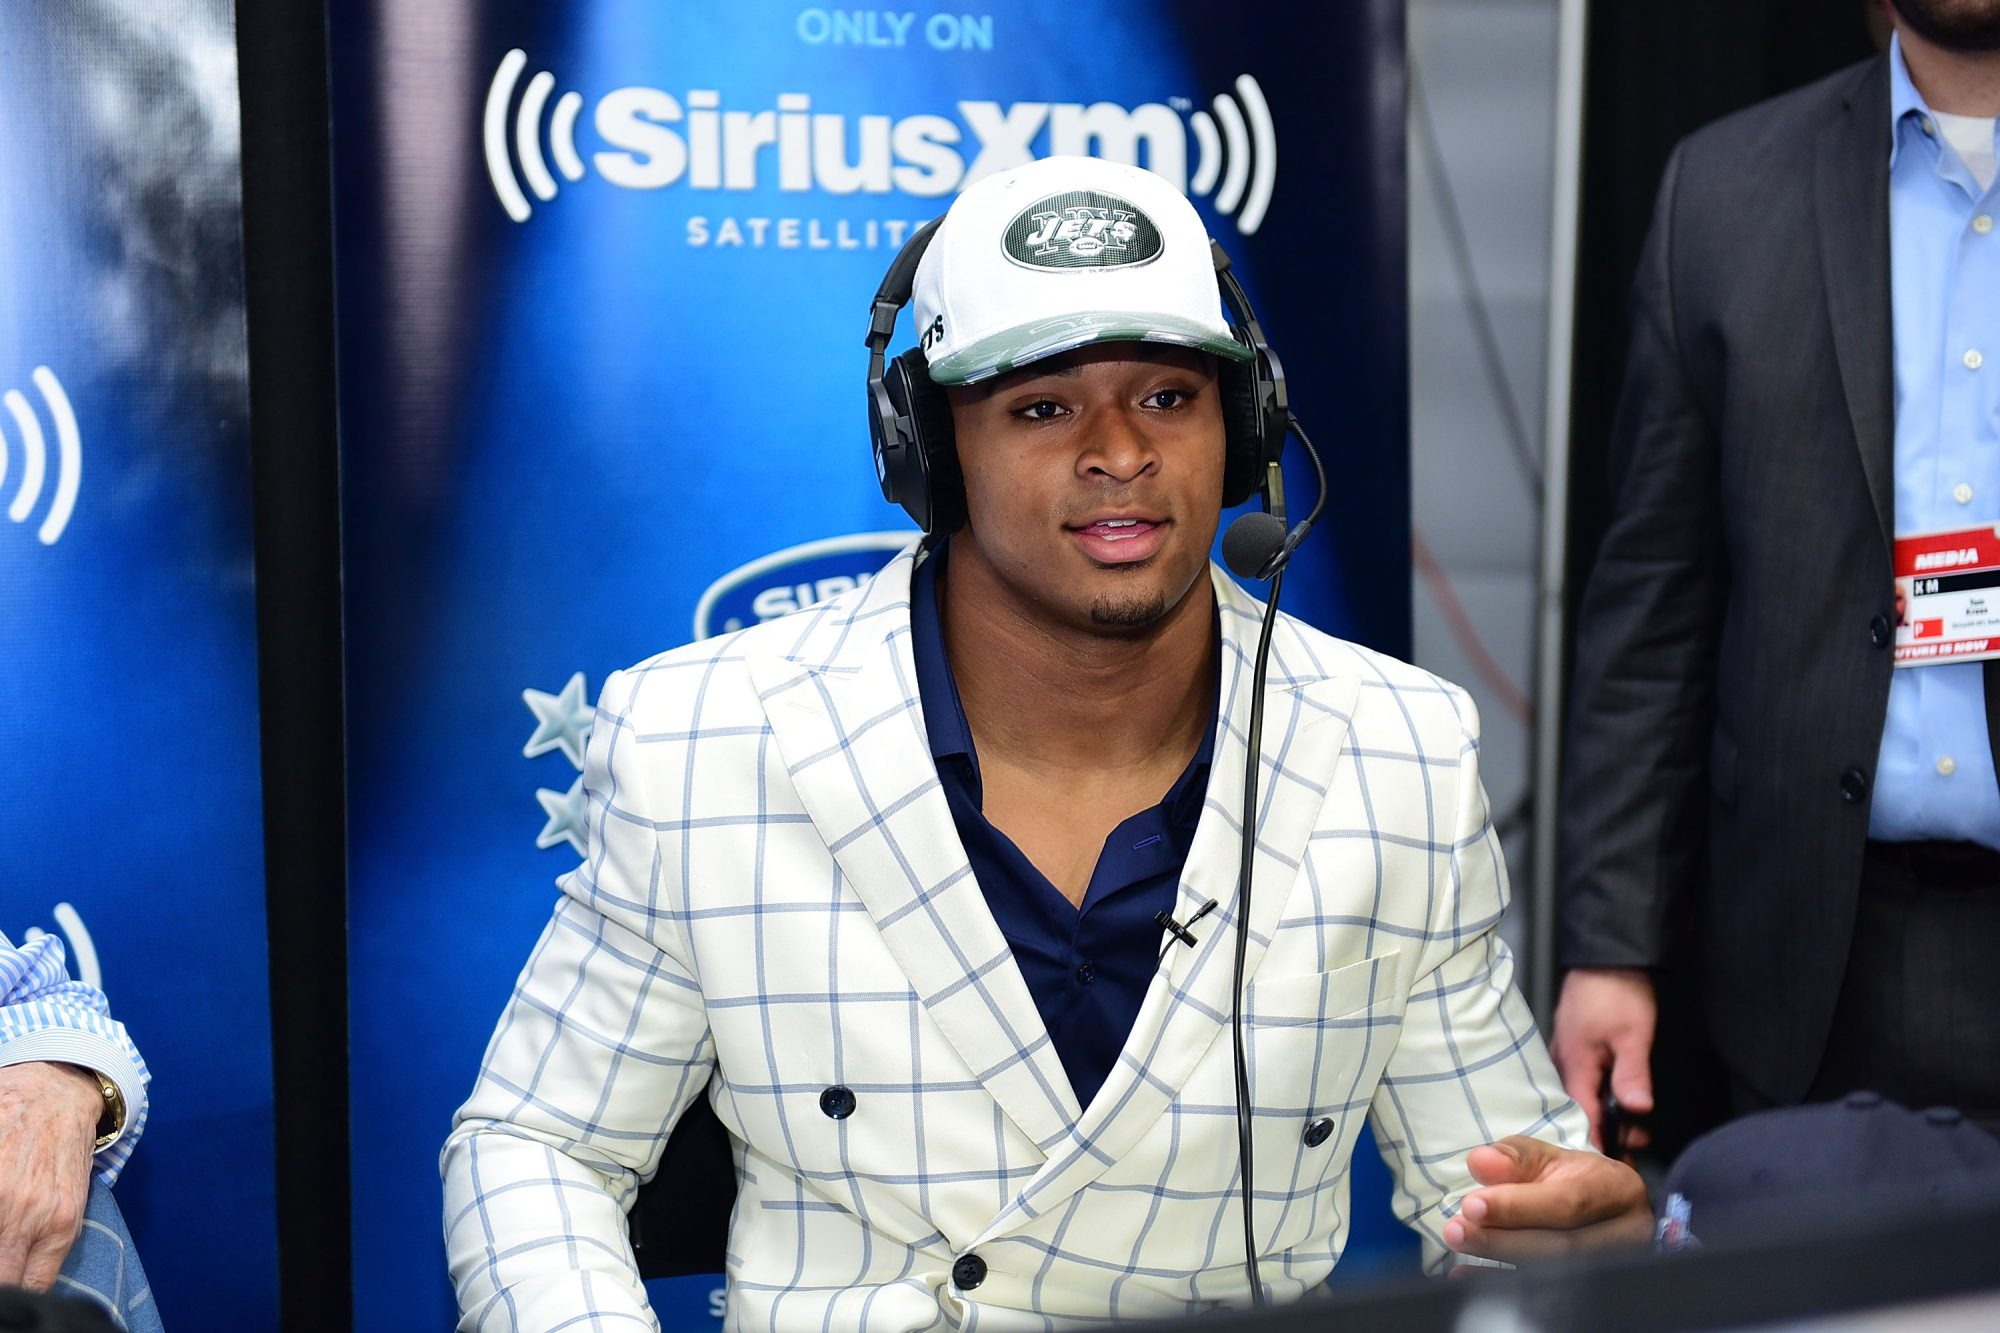 New York Jets Rookie Jamal Adams Admits He Was a New York Giants Fan Growing Up